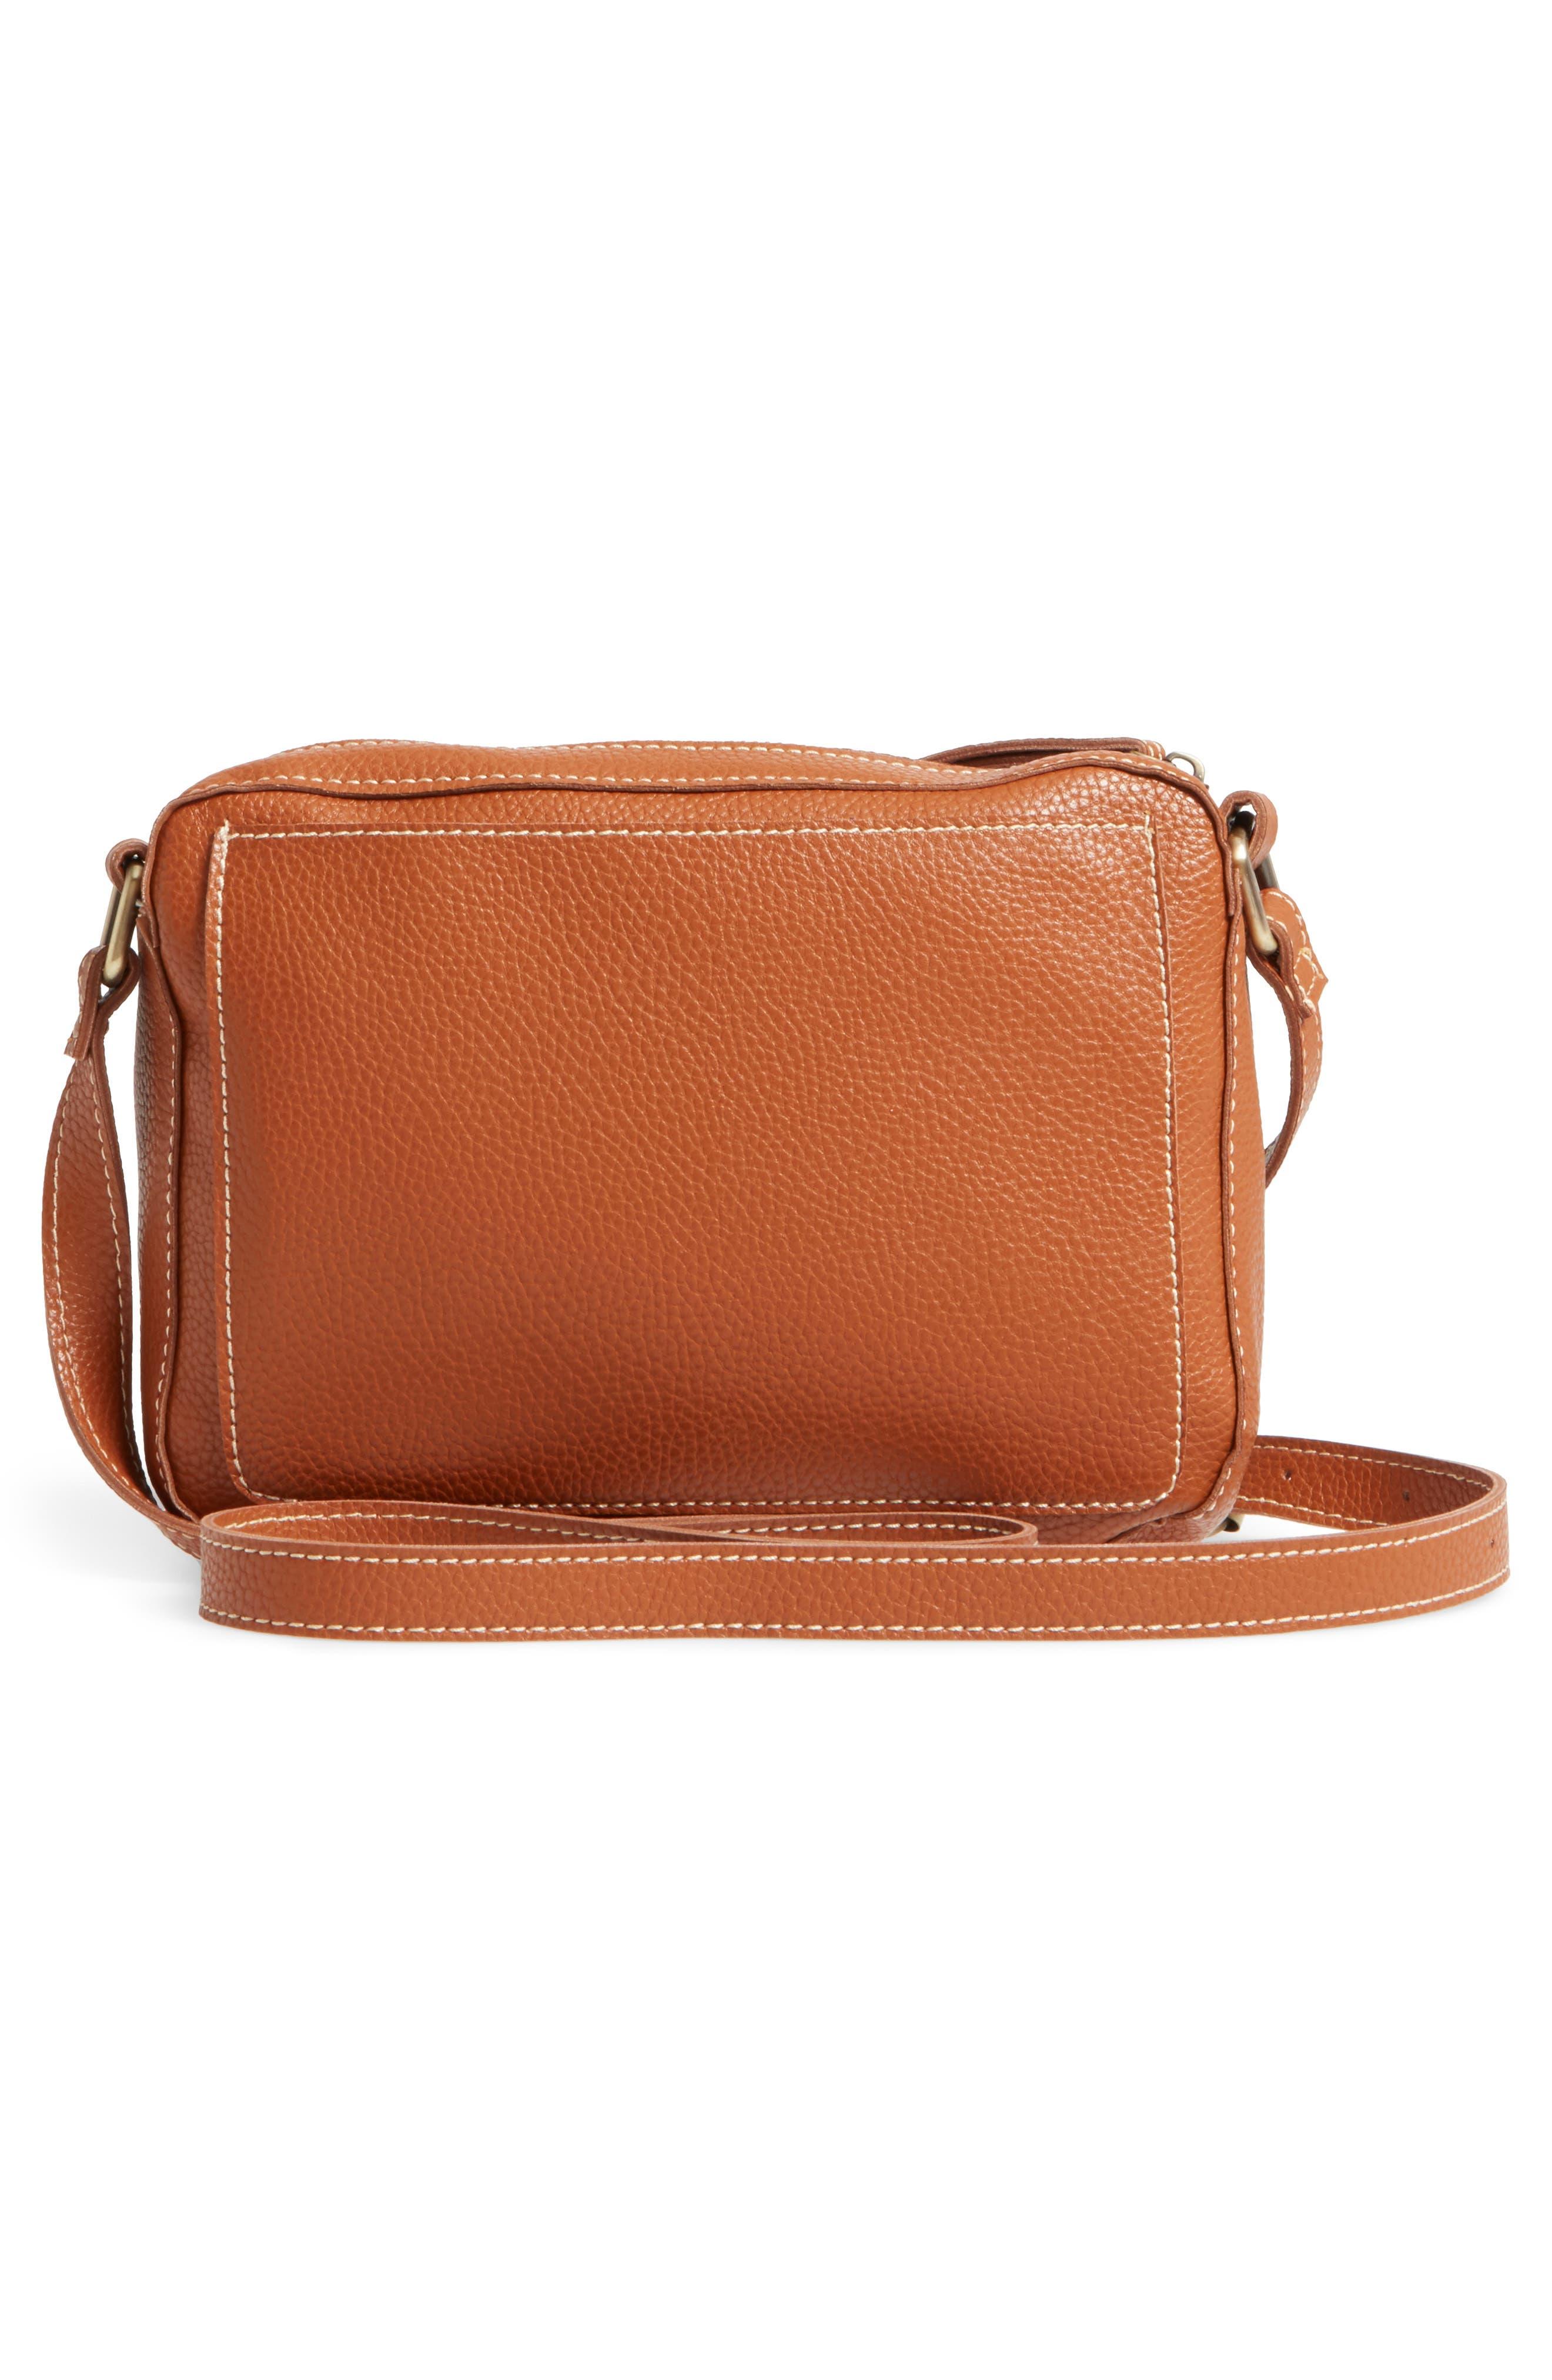 Skylar Faux Leather Crossbody Bag,                             Alternate thumbnail 2, color,                             Saddle